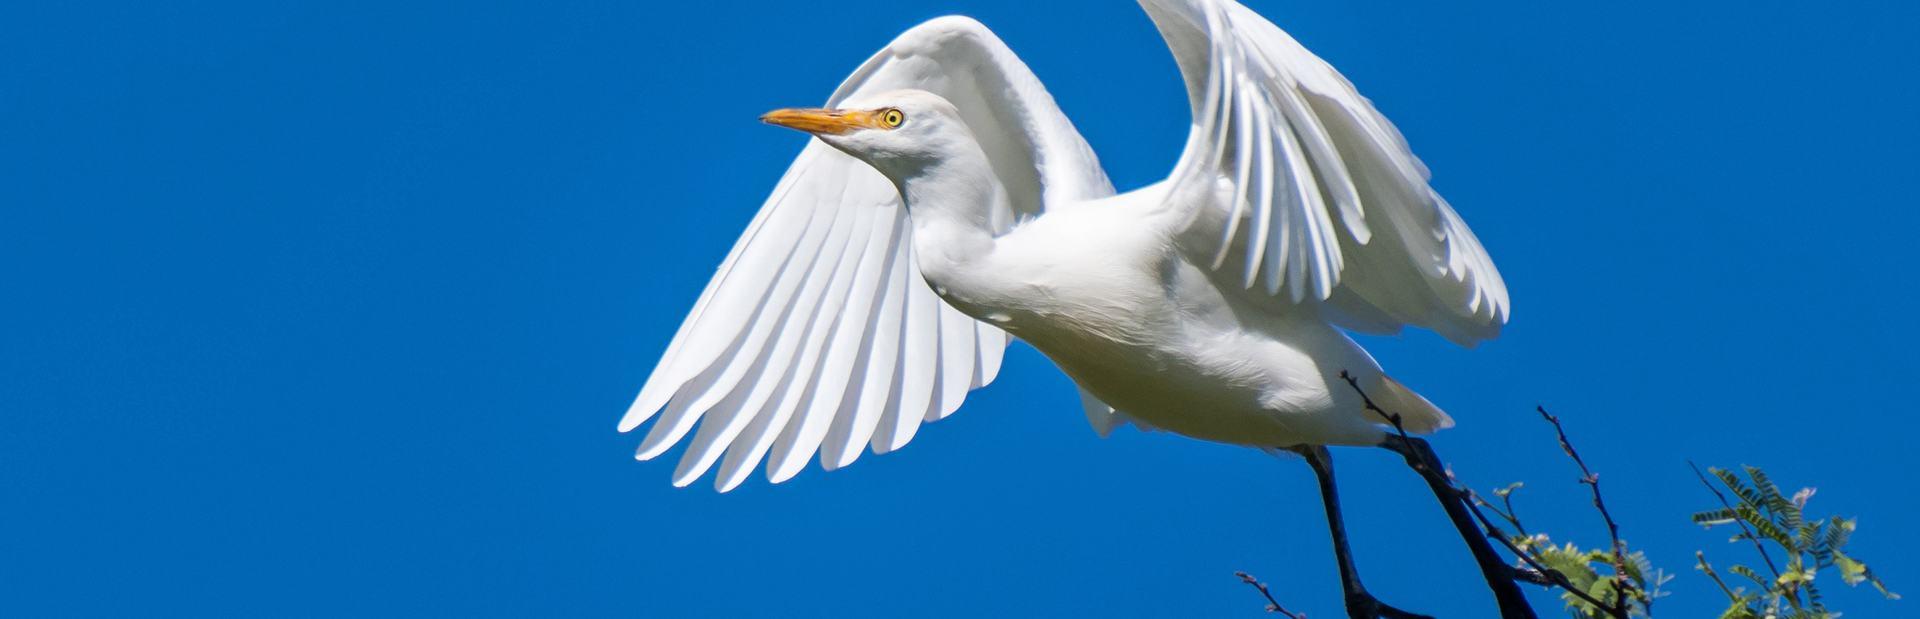 Thanda Bird Walk Image 1